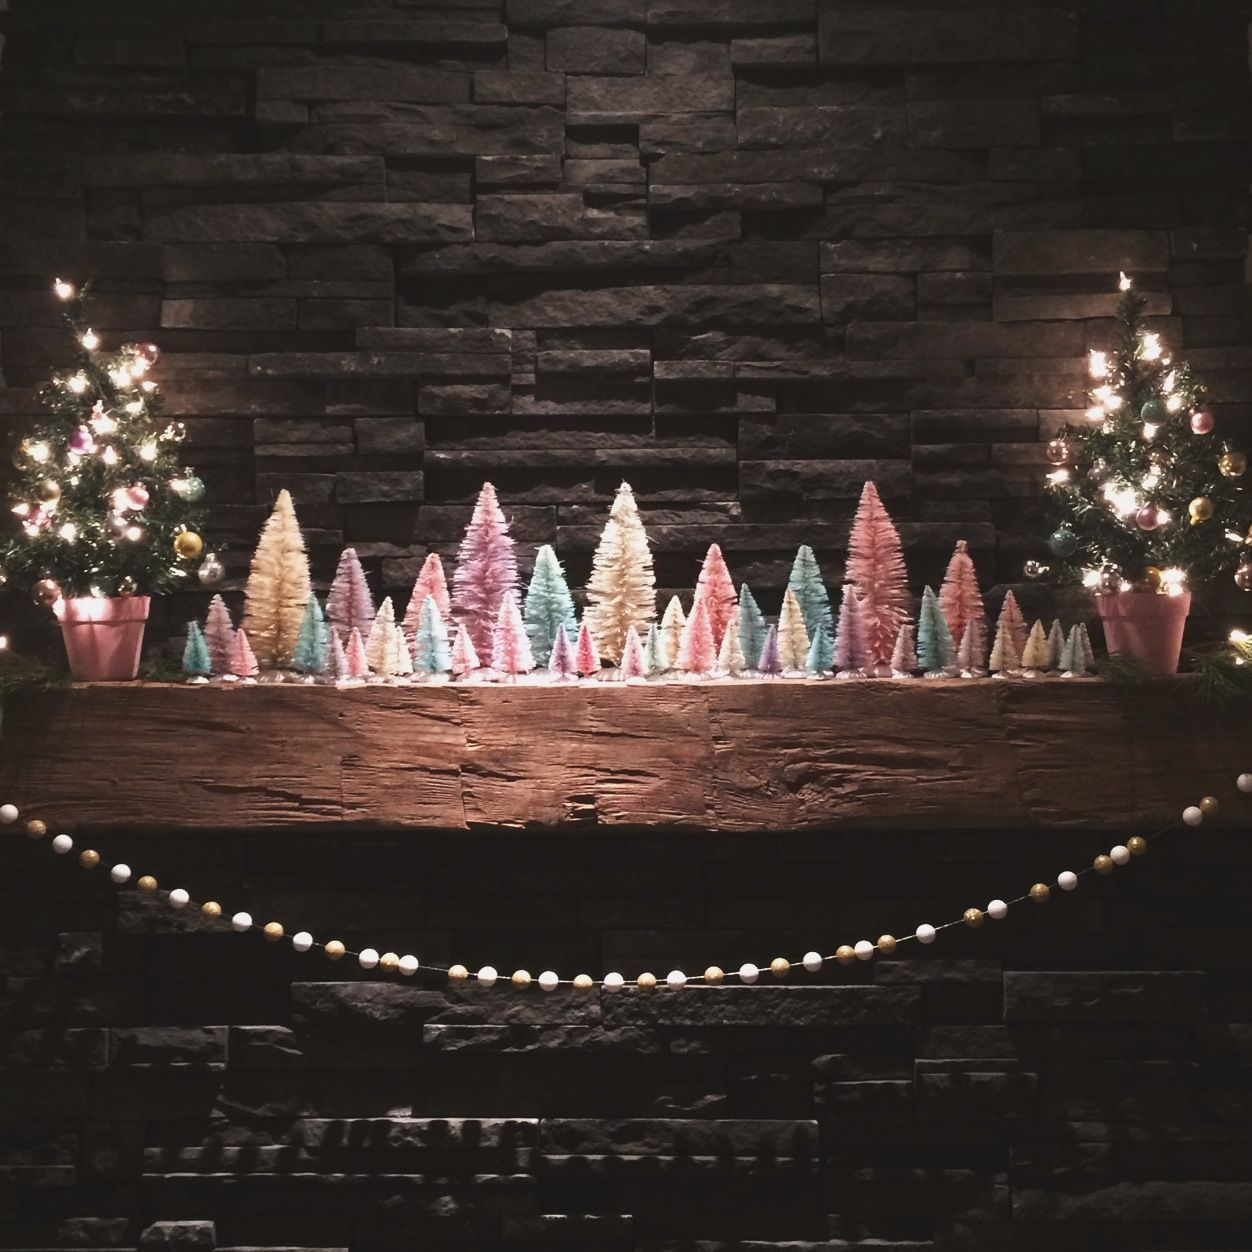 Diy Bottle Brush Christmas Tree Mantle Display Glitter The Girls Bottle Brush Christmas Trees Diy Bottle Christmas